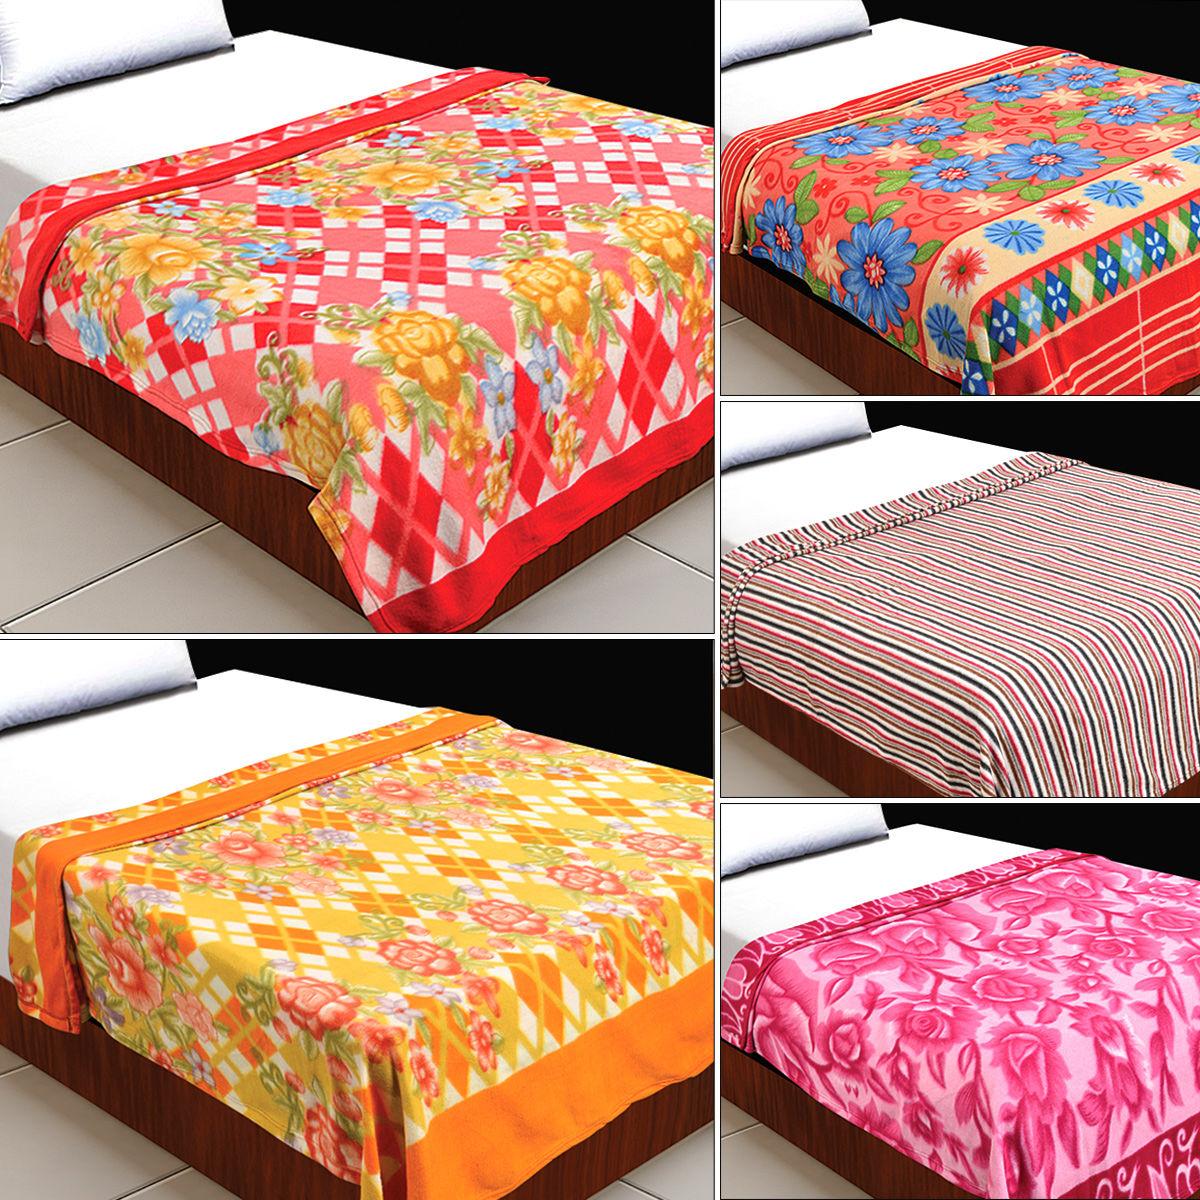 buy set of 5 printed fleece blankets online at best price in india